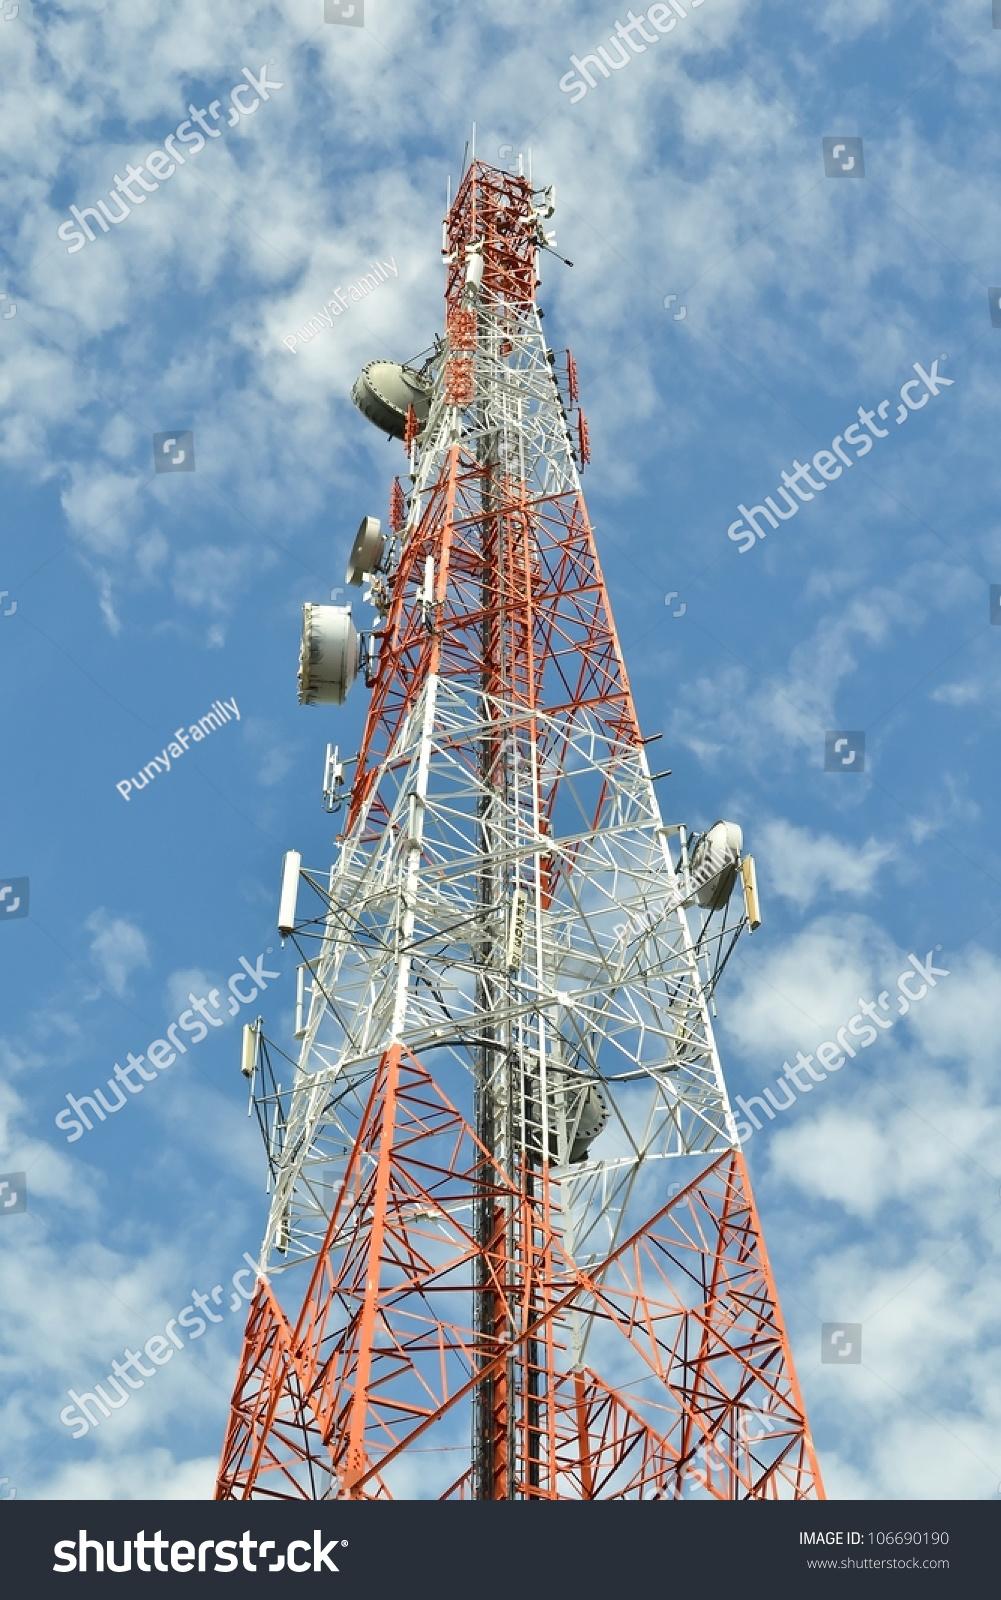 Antenna Tower Communication Stock Photo (Edit Now) 106690190